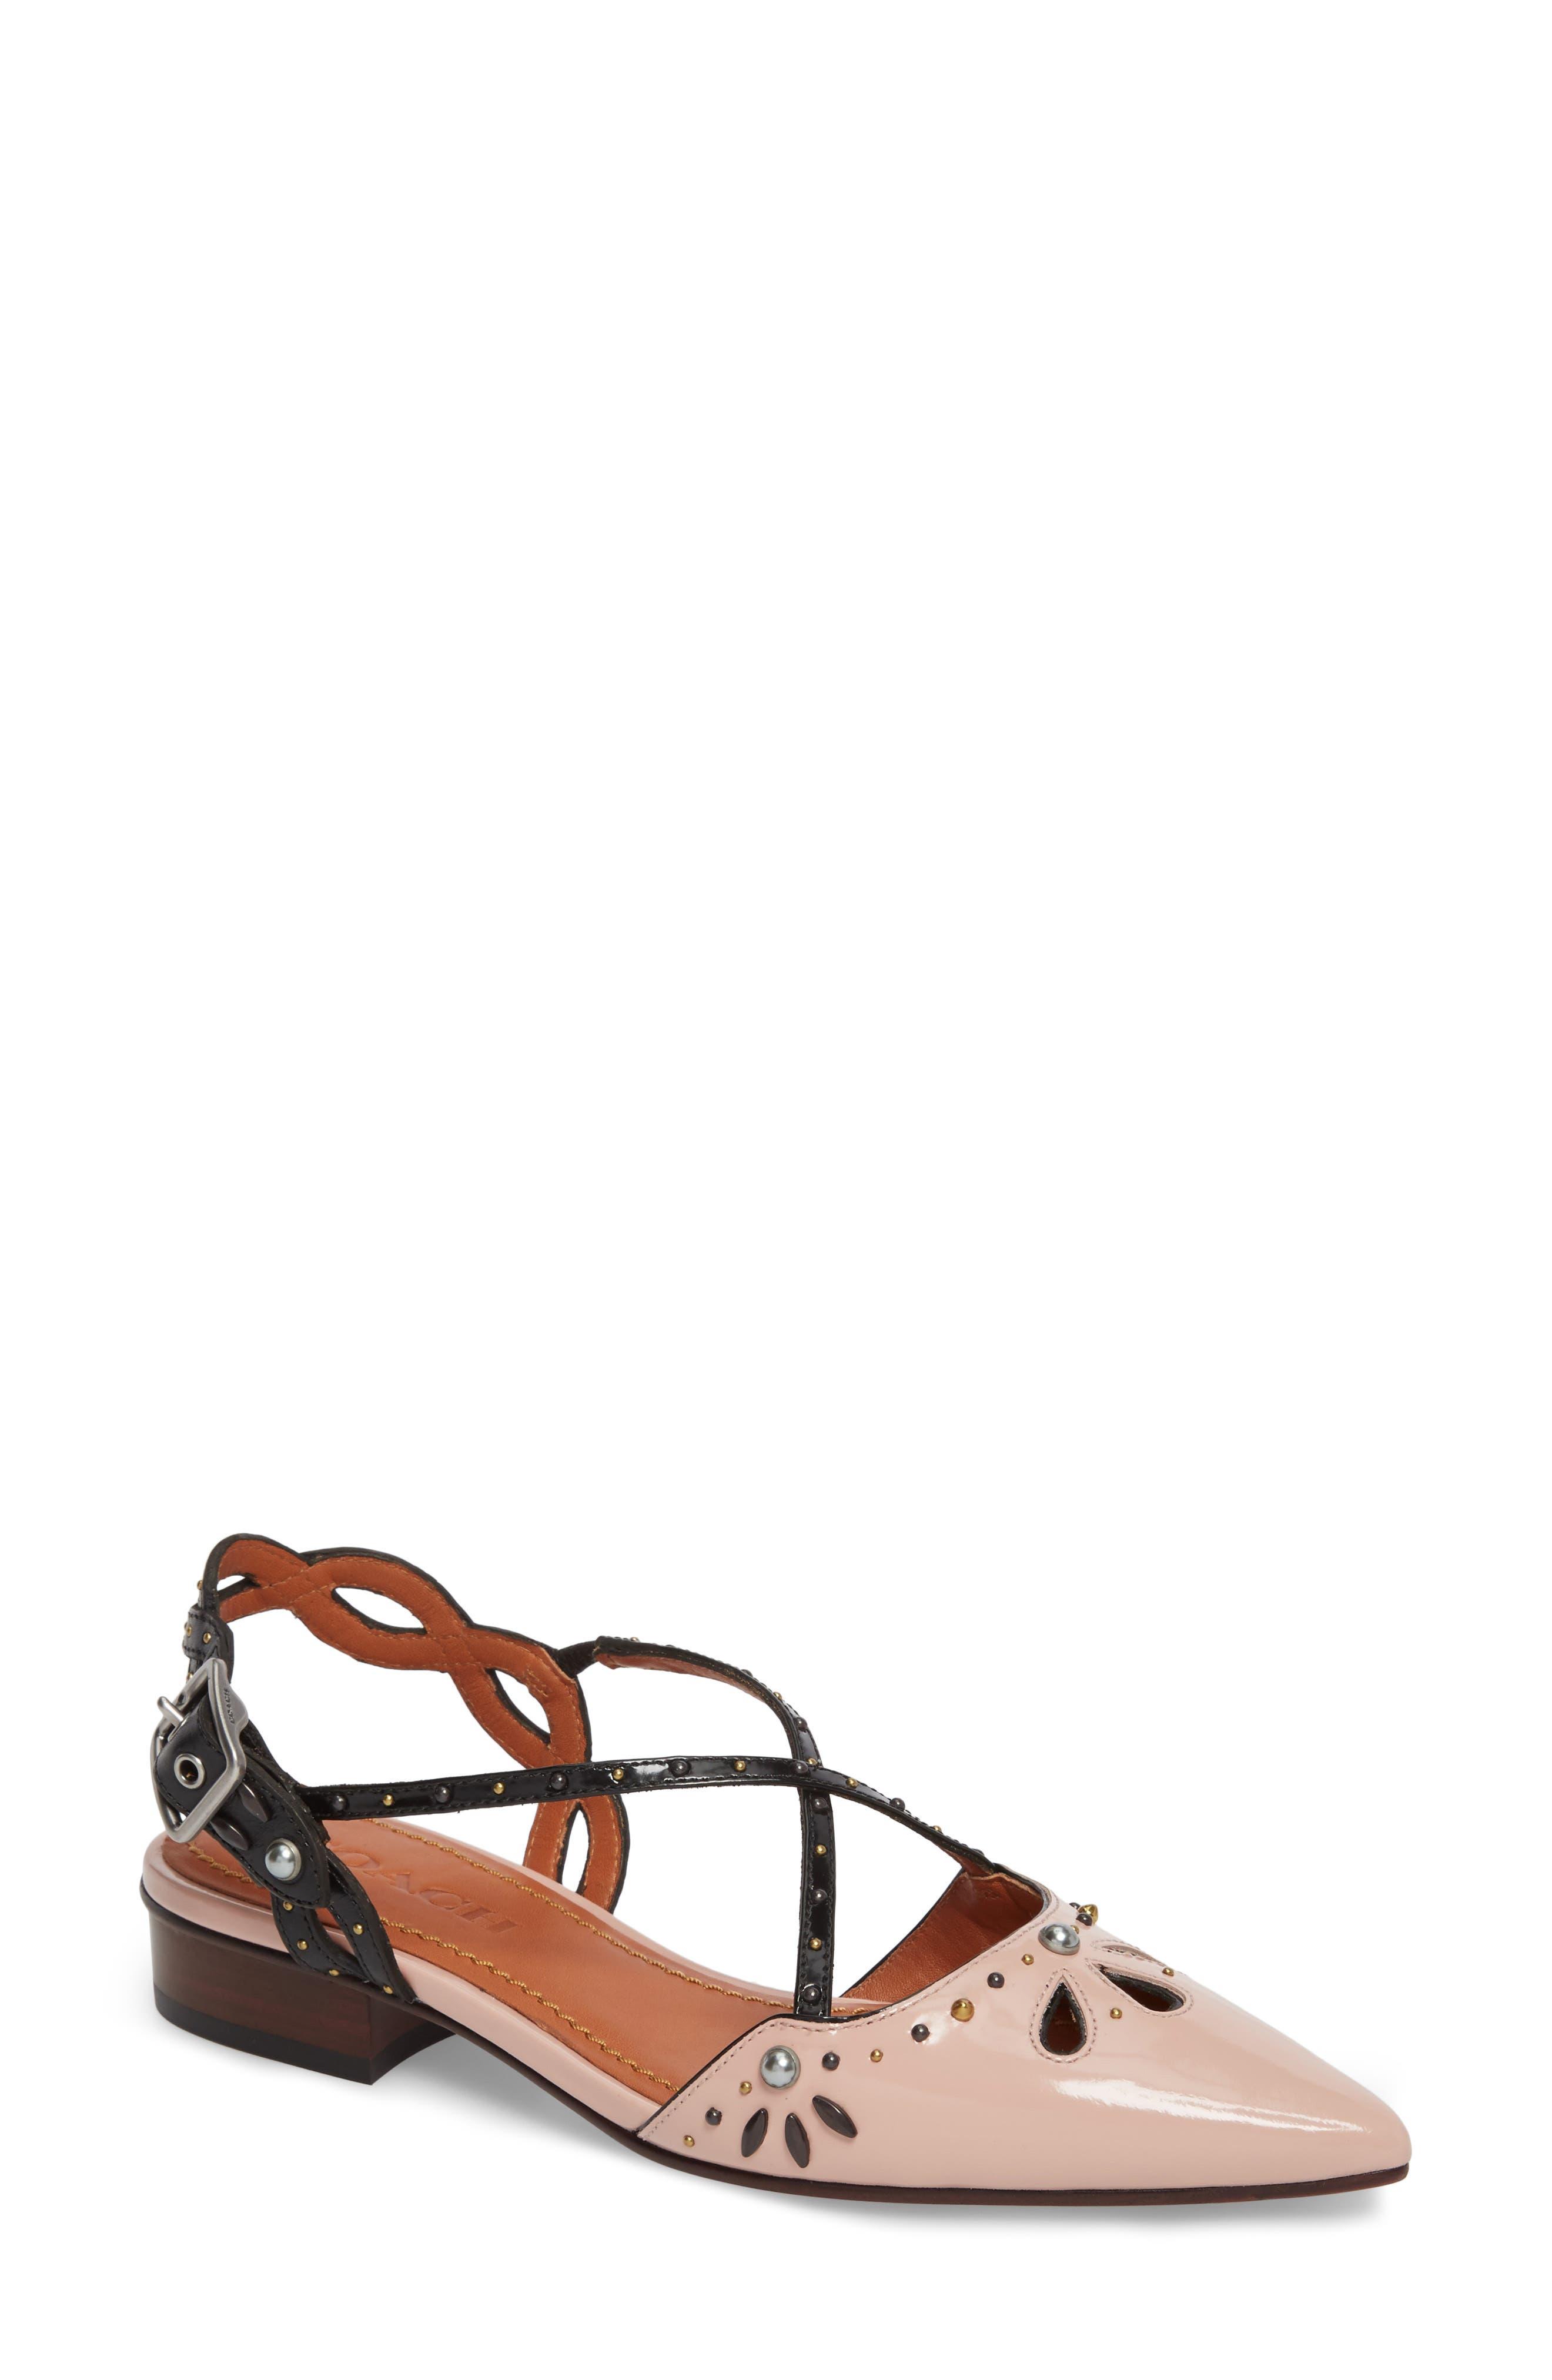 Prairie Rivet Sandal,                             Main thumbnail 1, color,                             Pink/ Black Leather